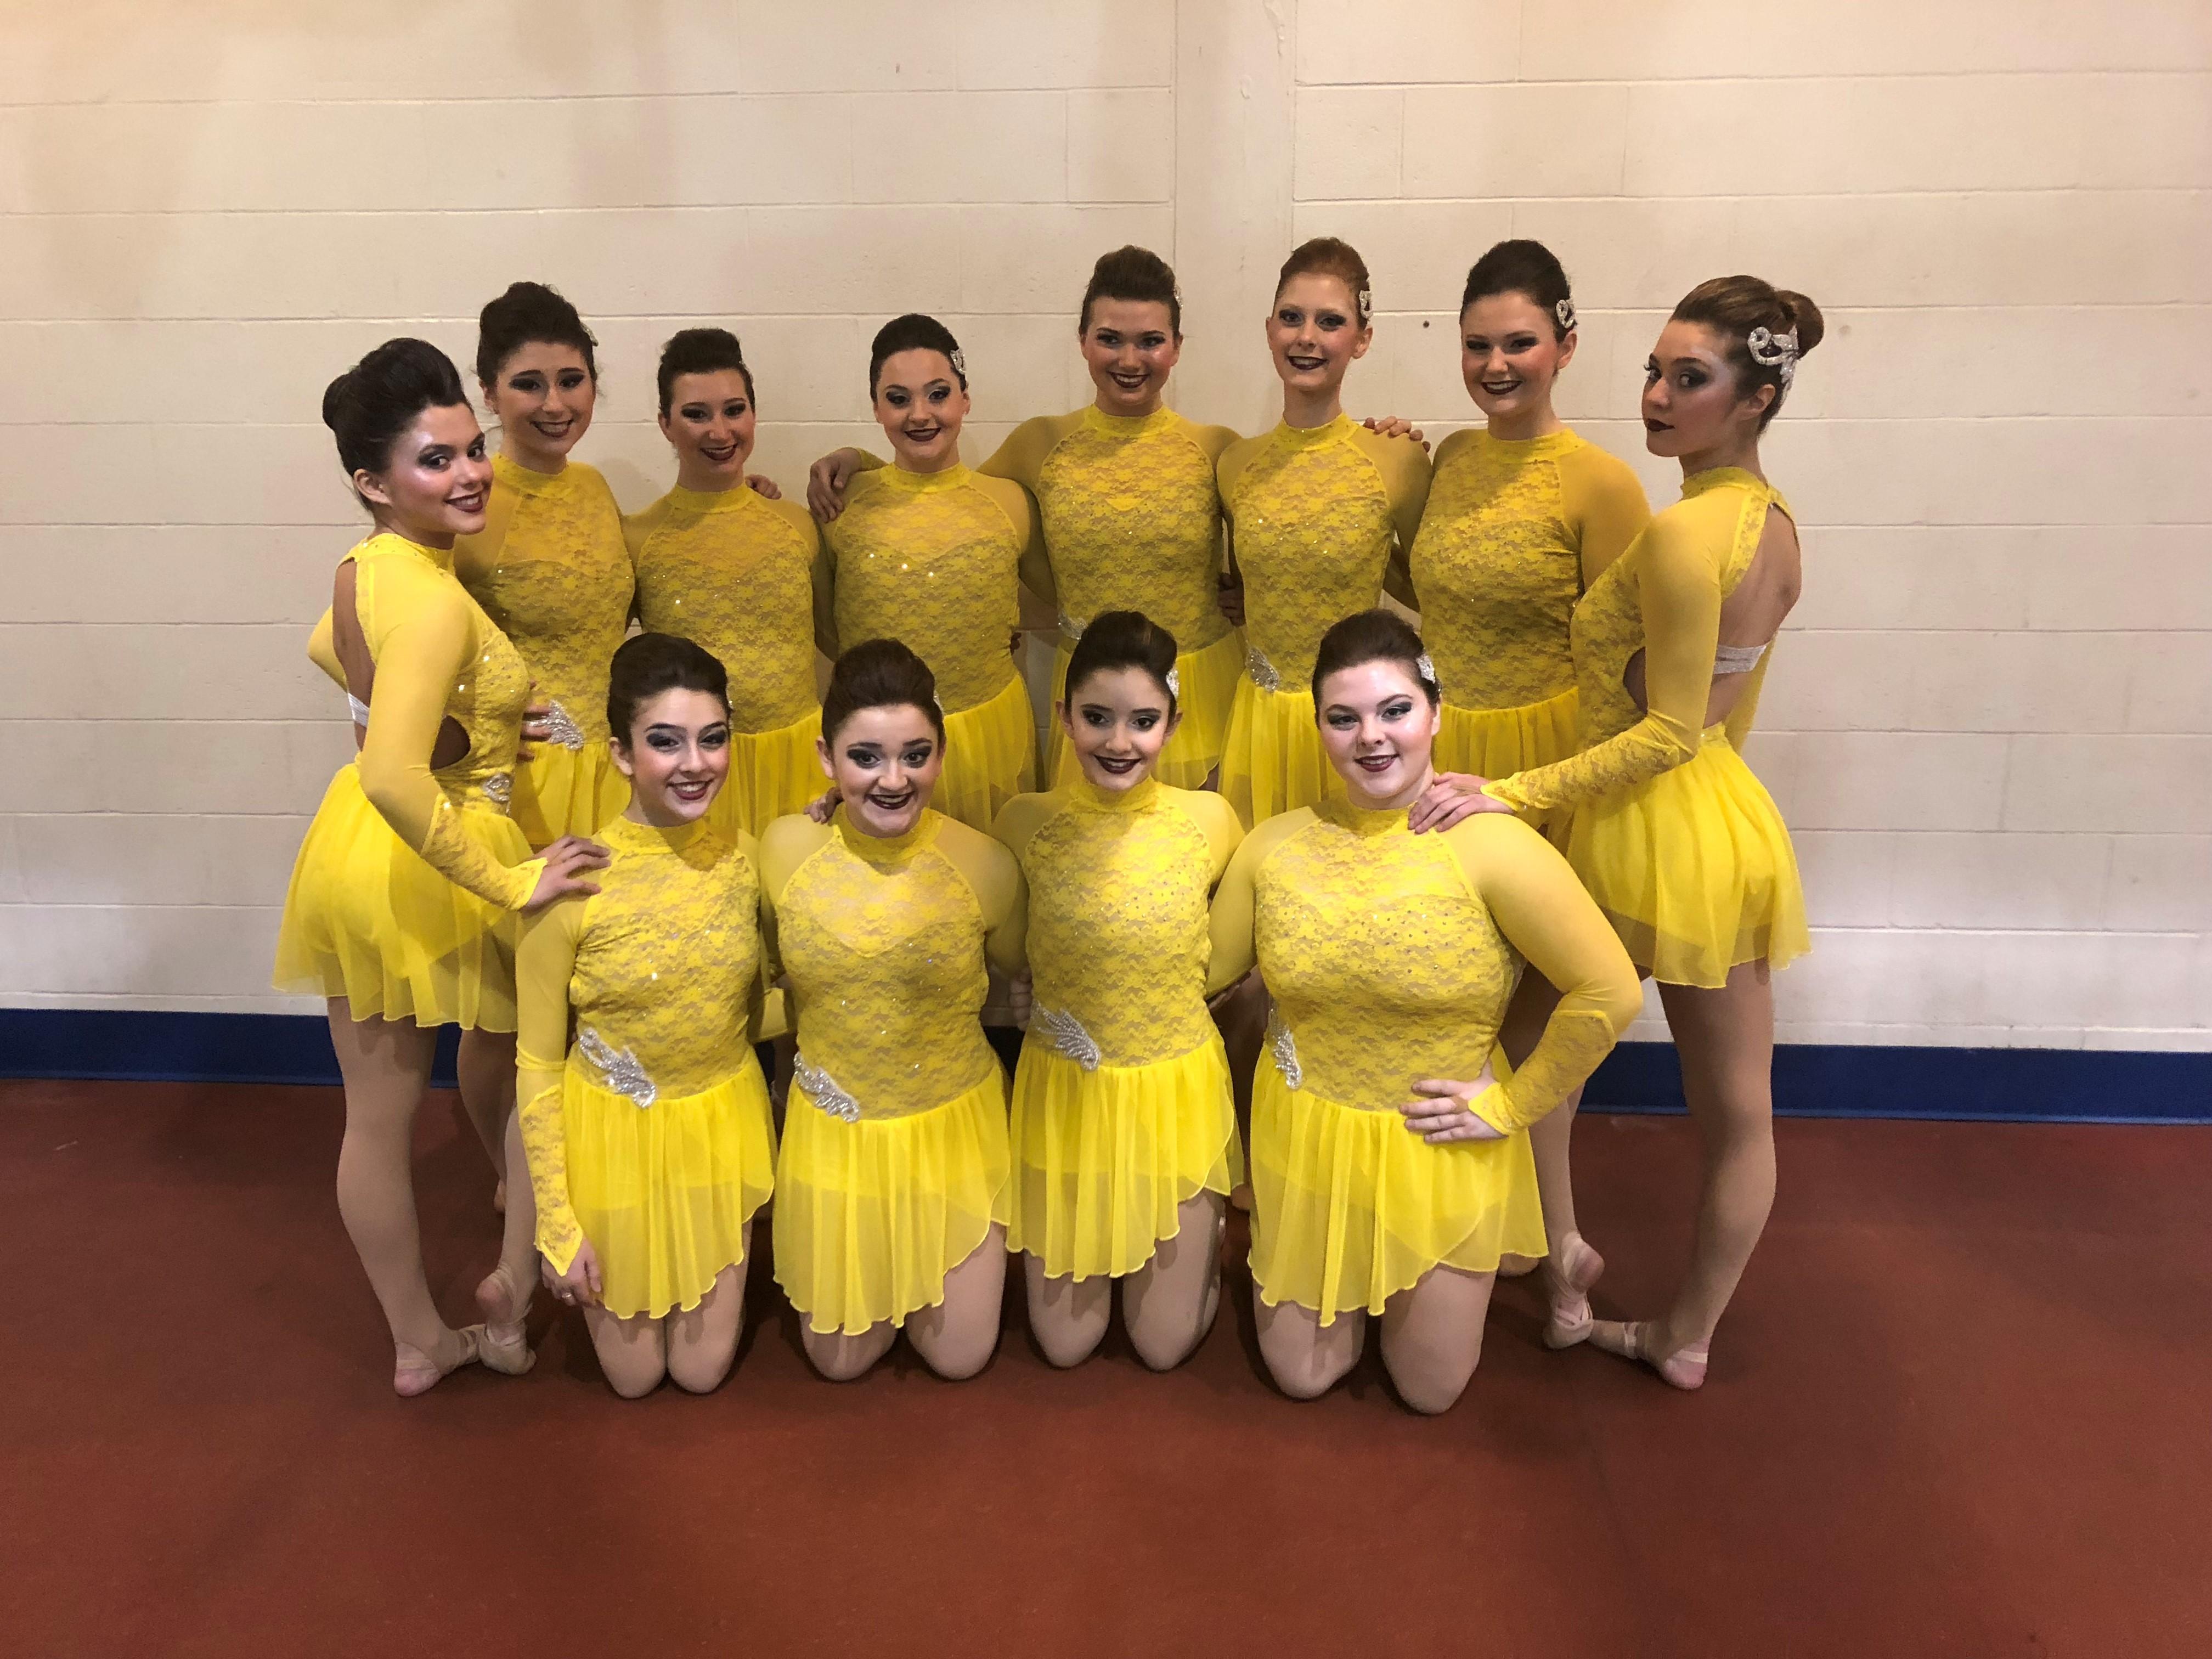 High school dance team custom jazz dress